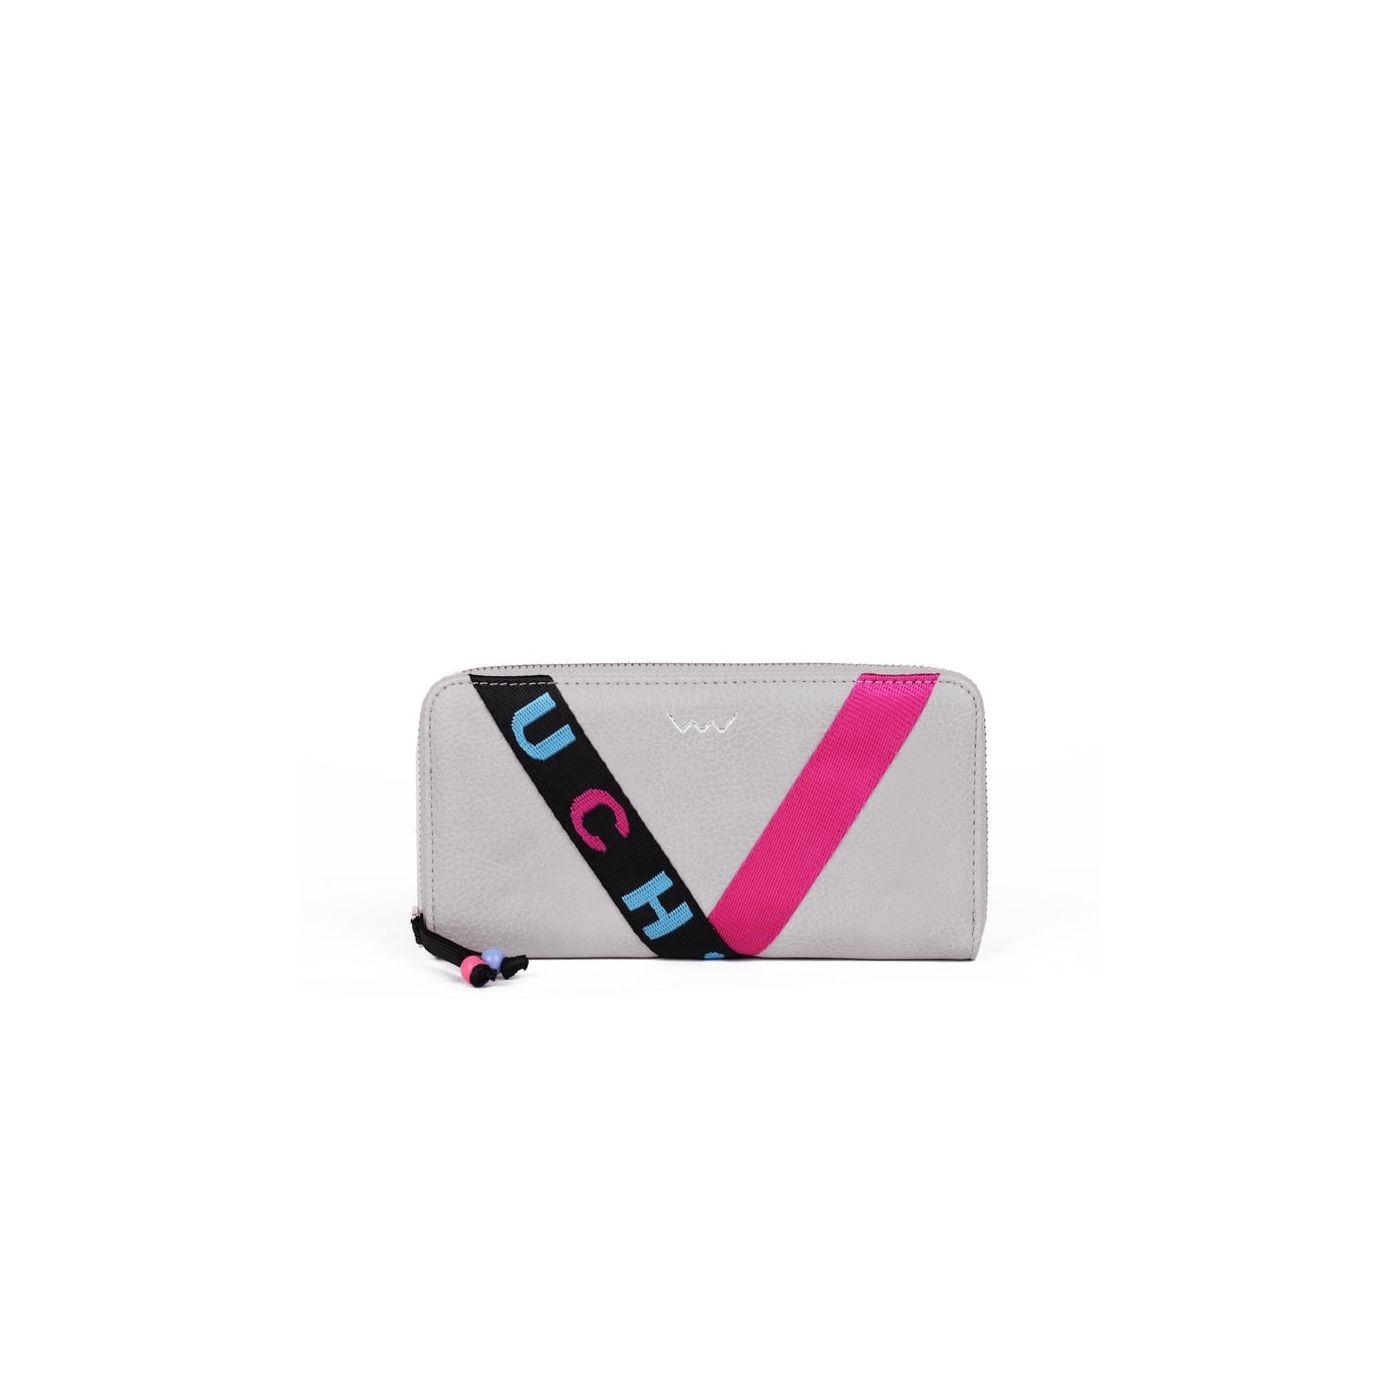 Women's wallet VUCH Zippy Collection